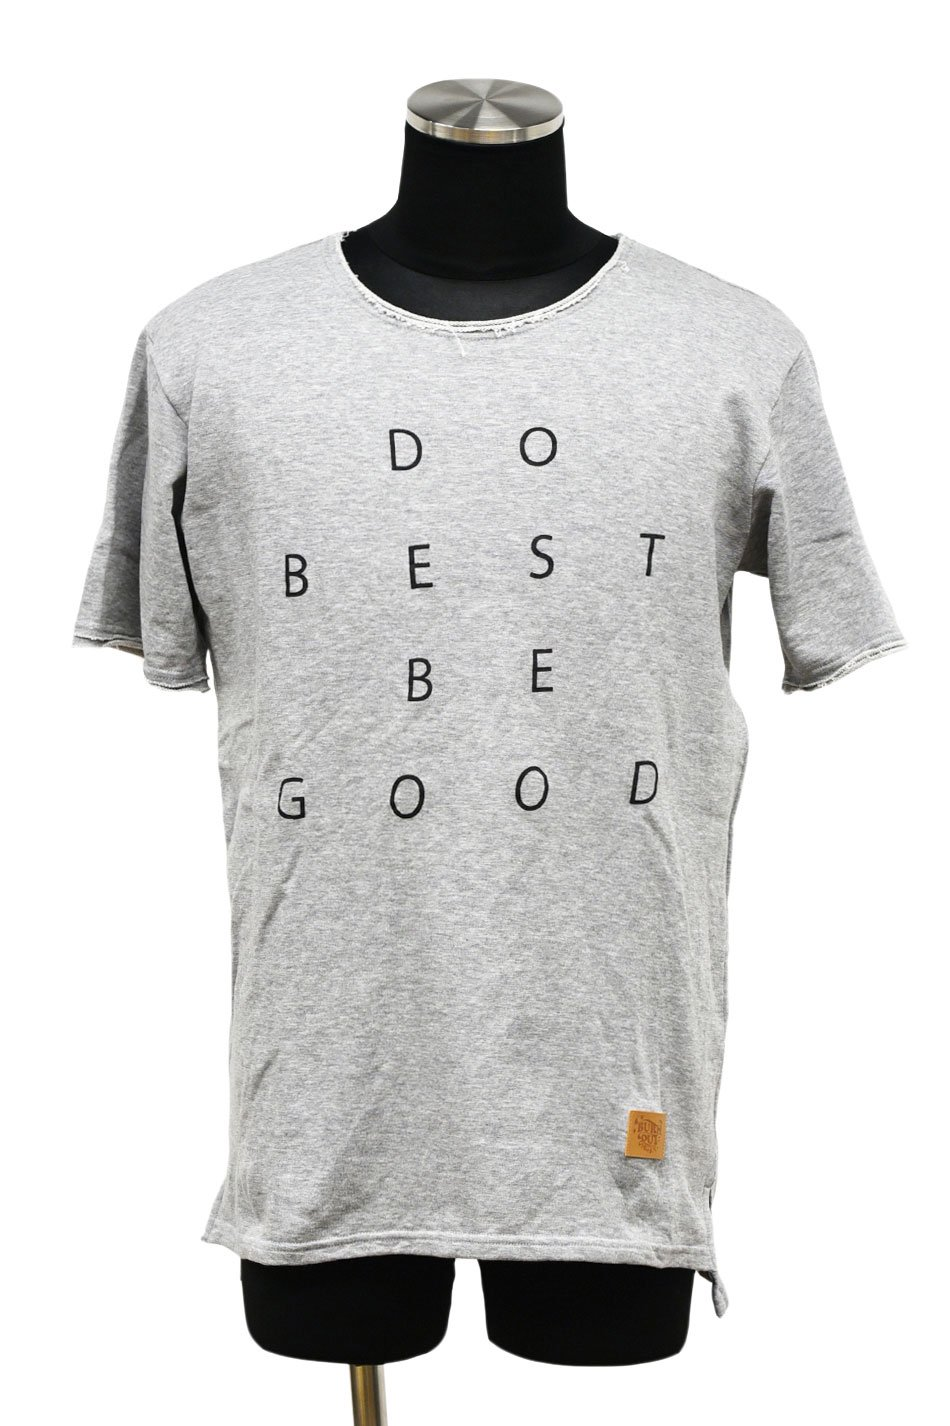 【JG限定】BURNOUT(バーンアウト )【DO BE】ショートスリーブカットソー / グレー×ブラック